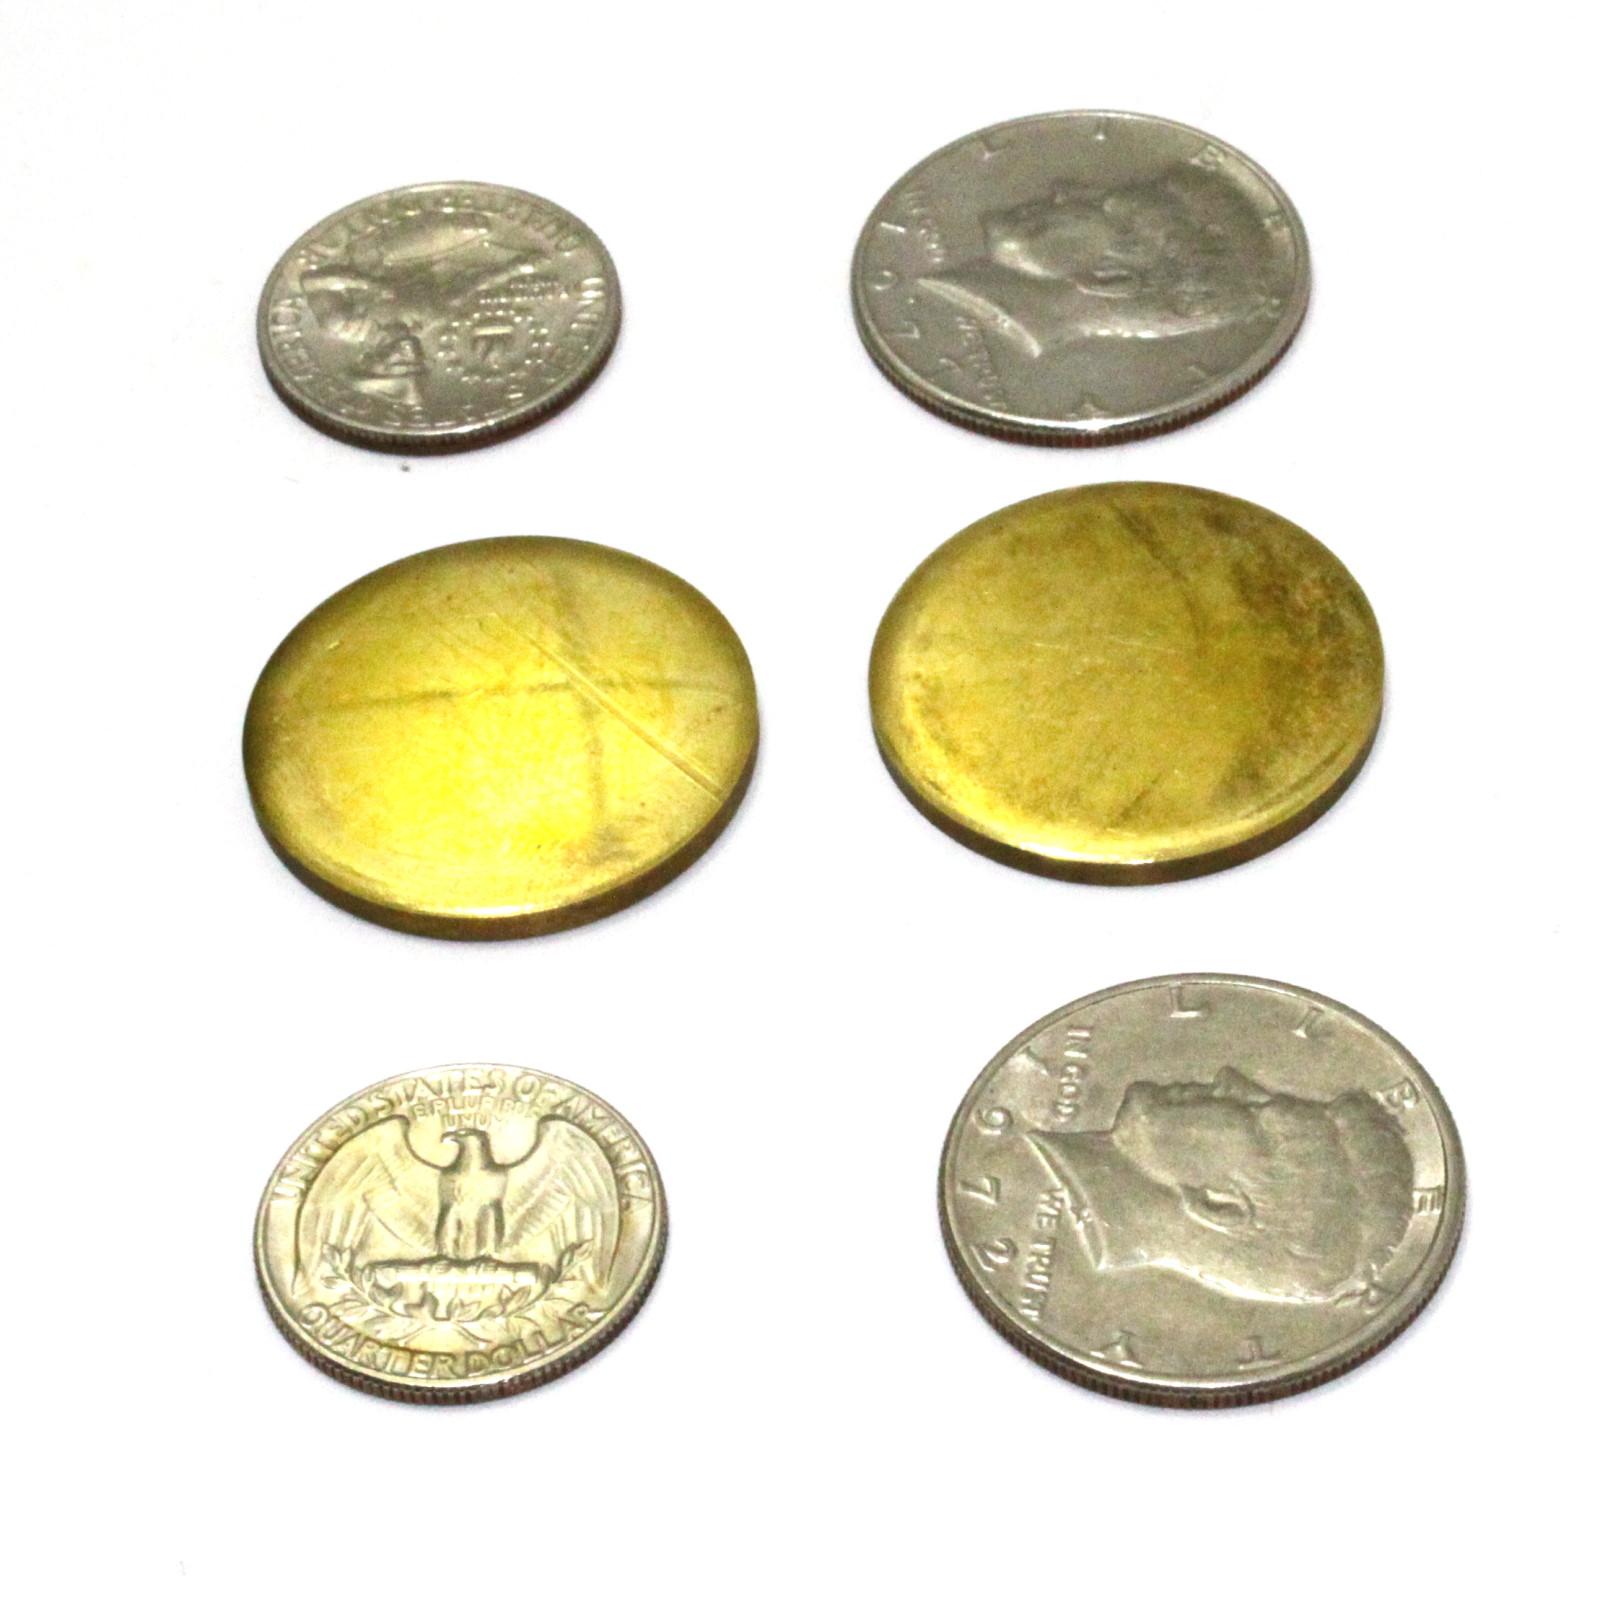 Kangaroo Coins by Eddie Gibson